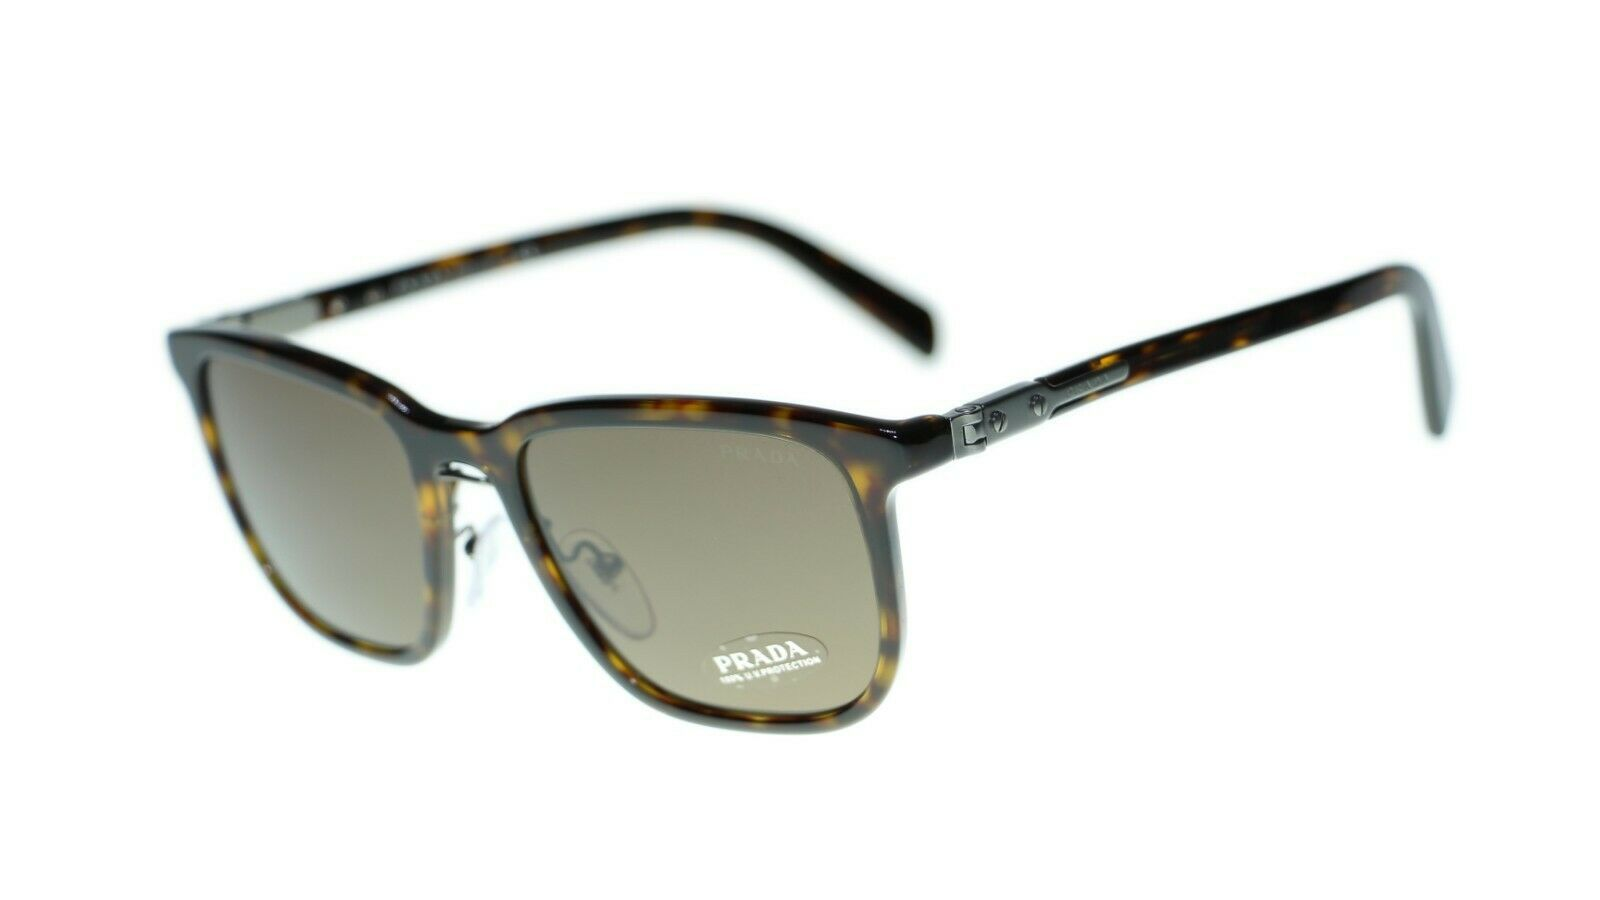 New Prada PR02TS Square Authentic Sunglasses